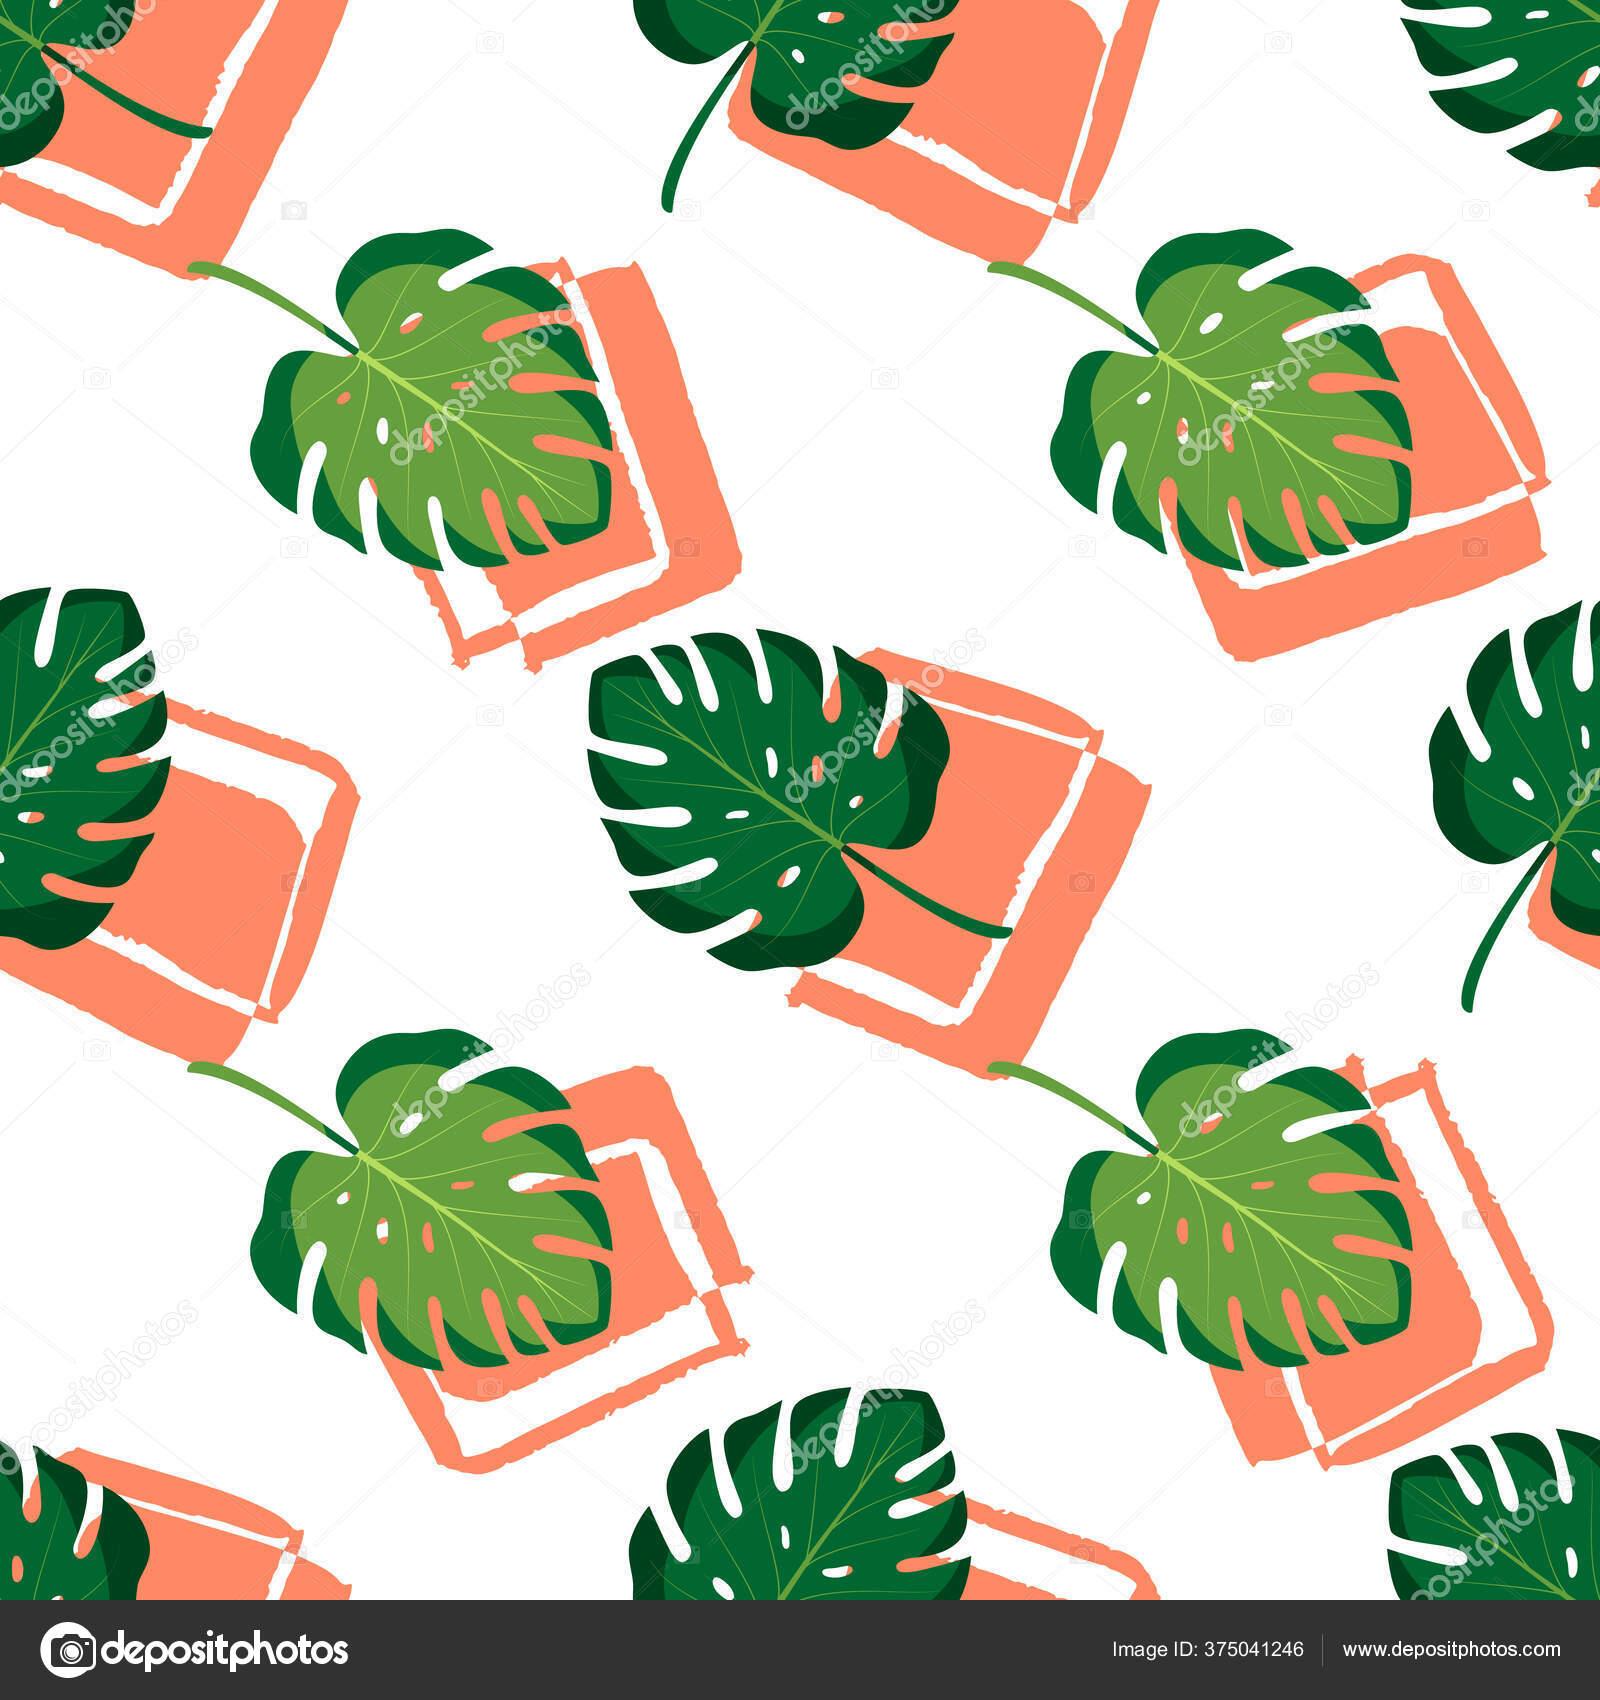 depositphotos 375041246 stock illustration tropical seamless pattern monstera leaves